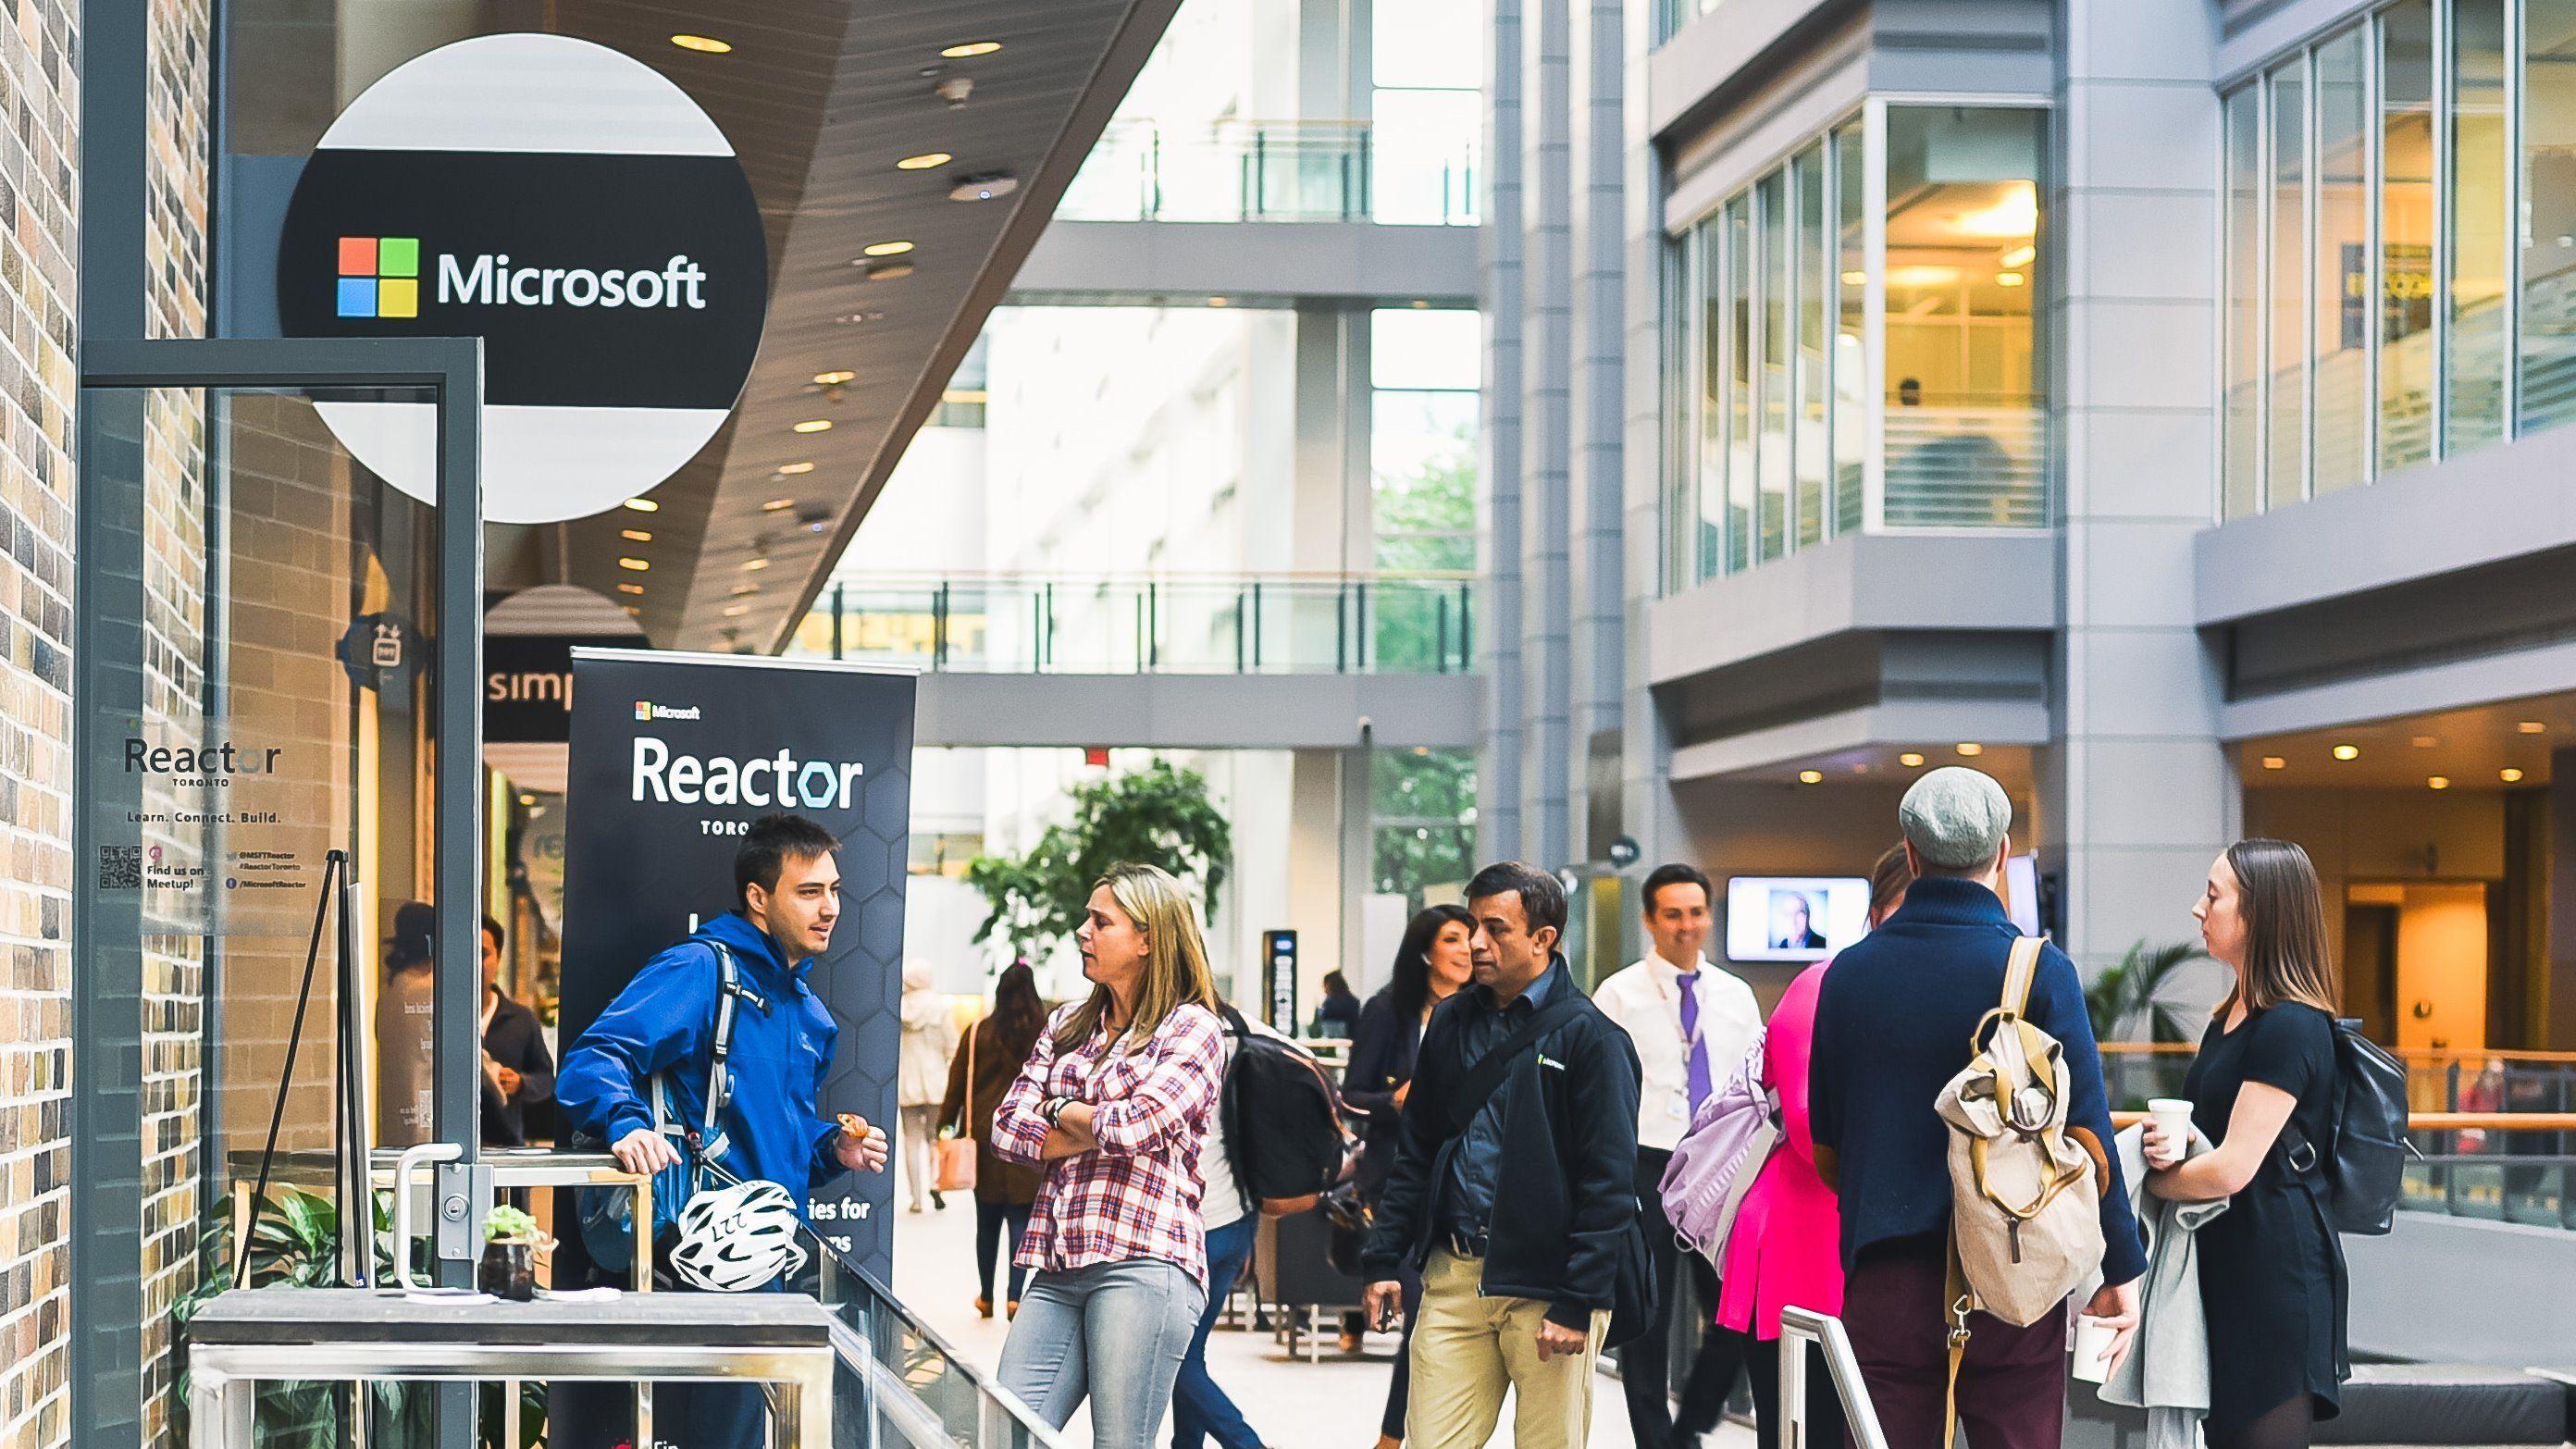 Microsoft Reactor Toronto